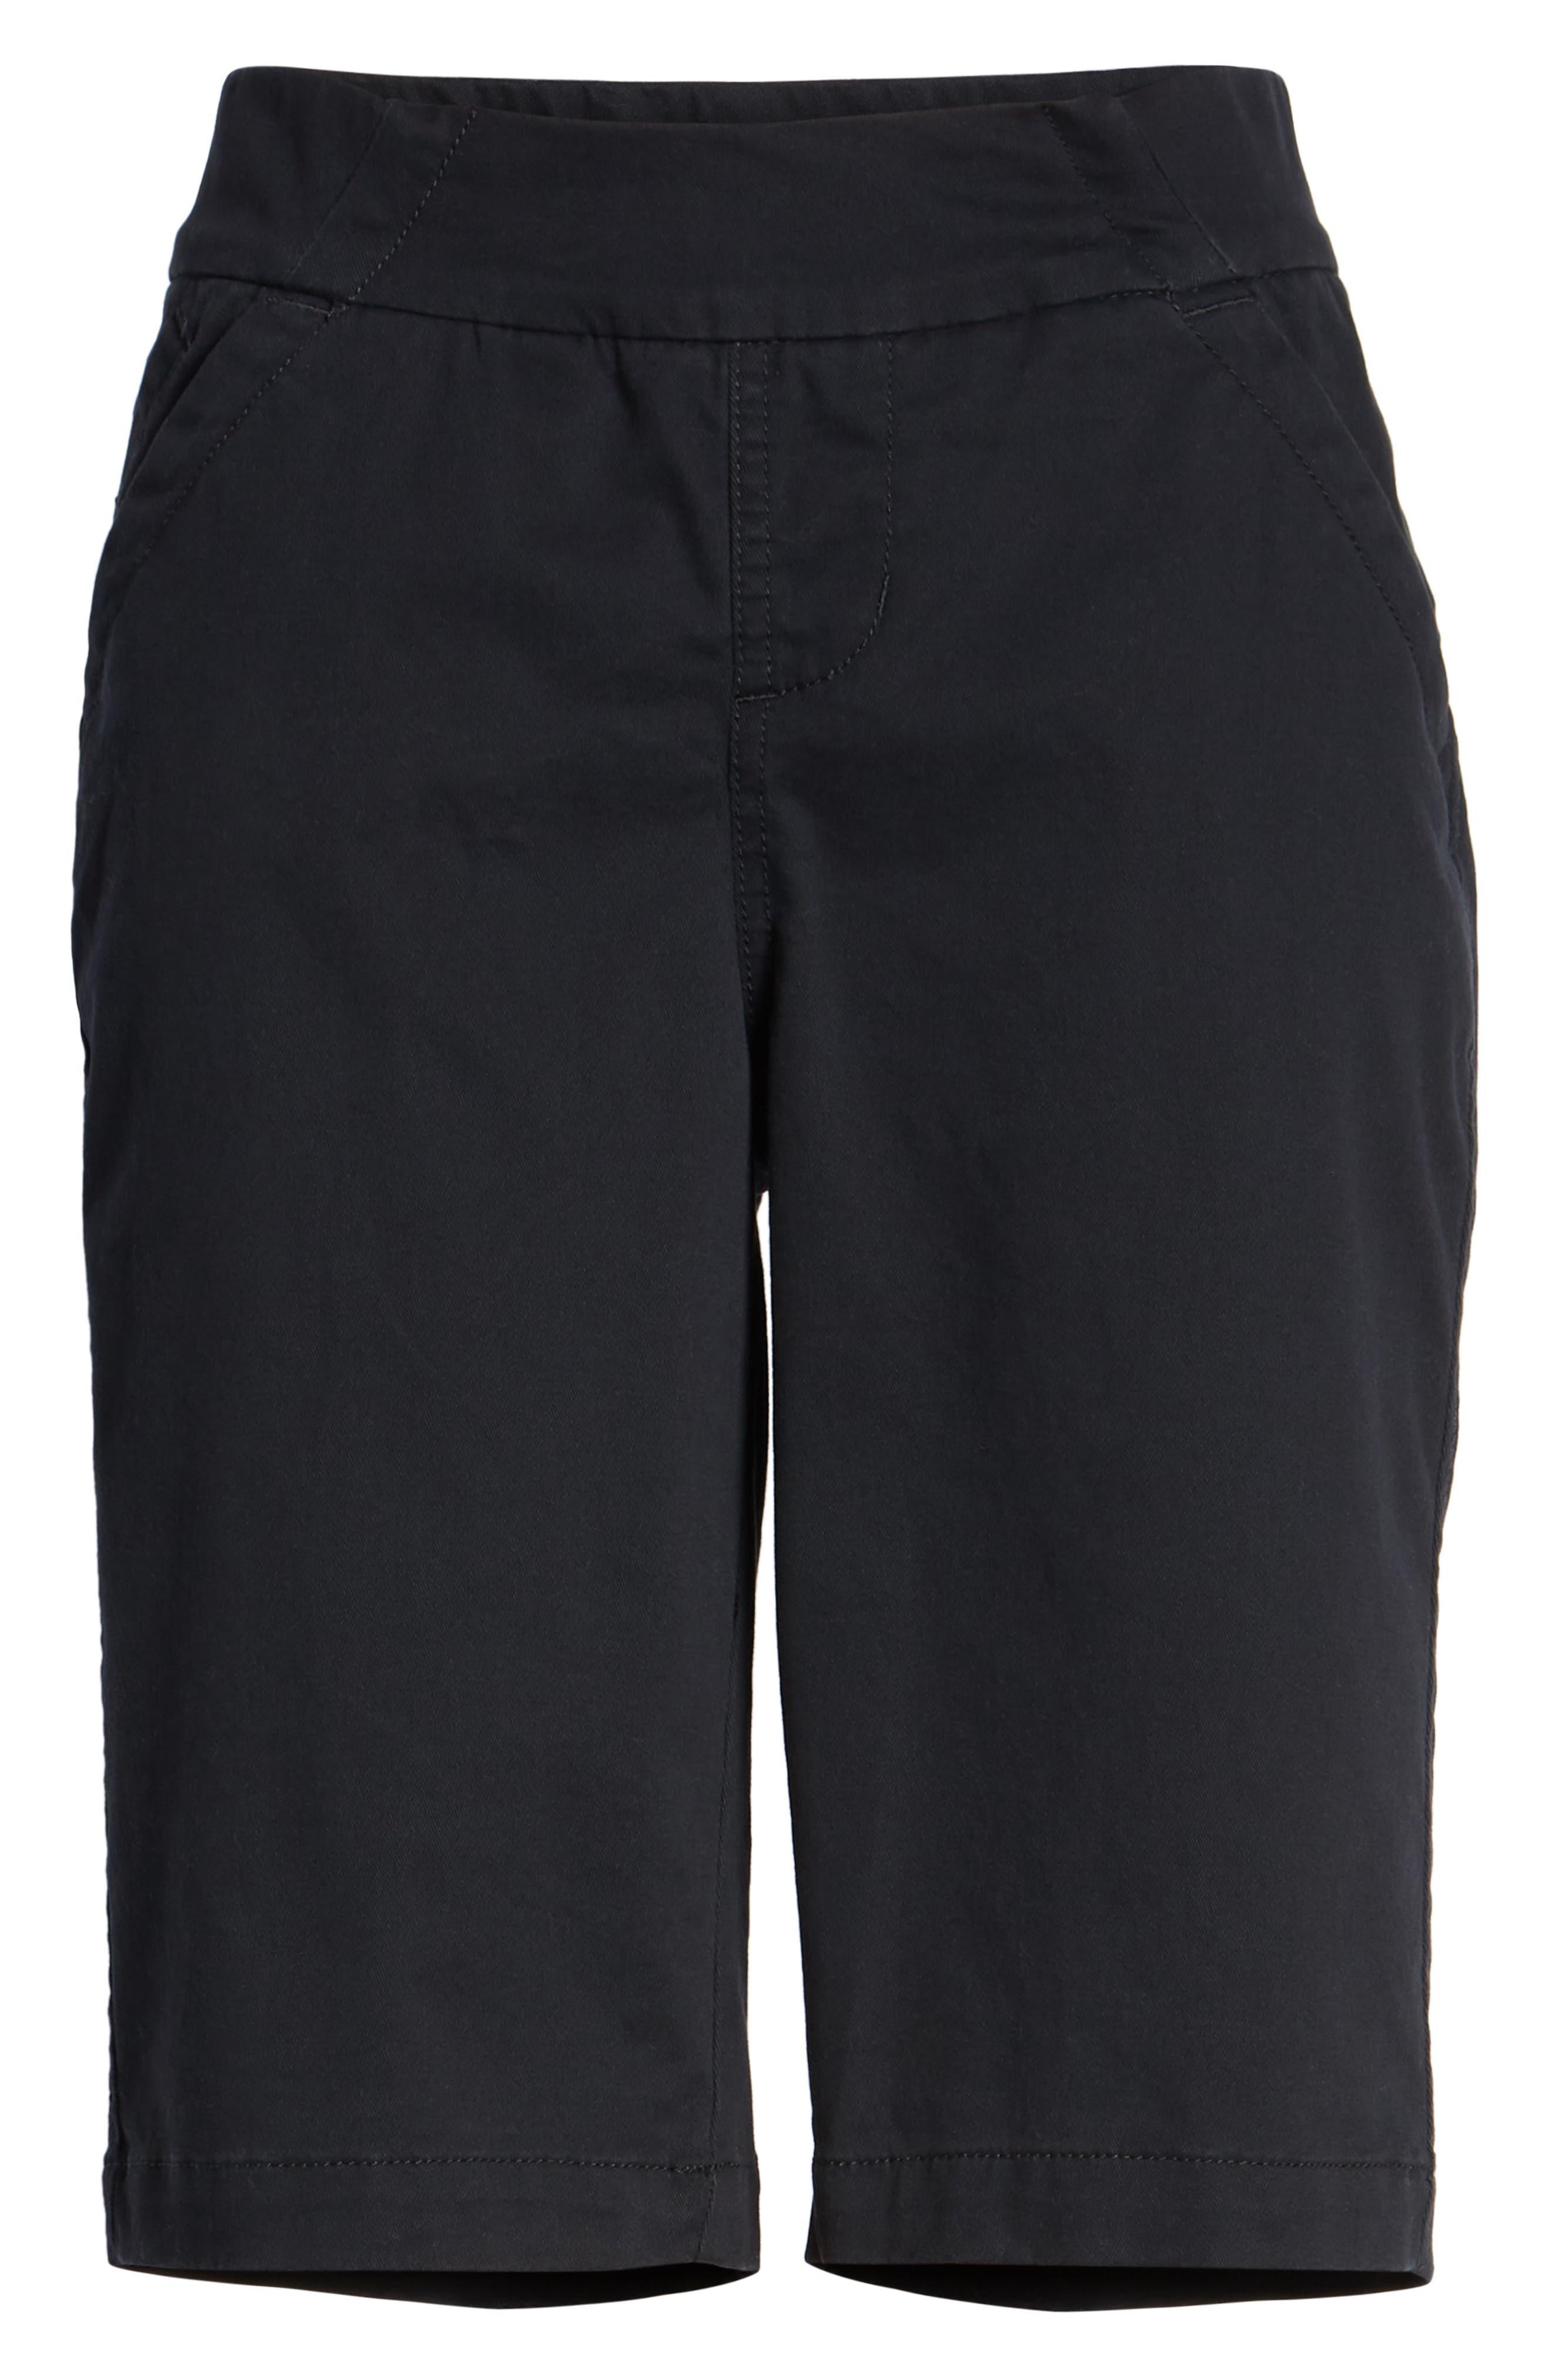 JAG JEANS, Gracie Bermuda Shorts, Alternate thumbnail 7, color, BLACK